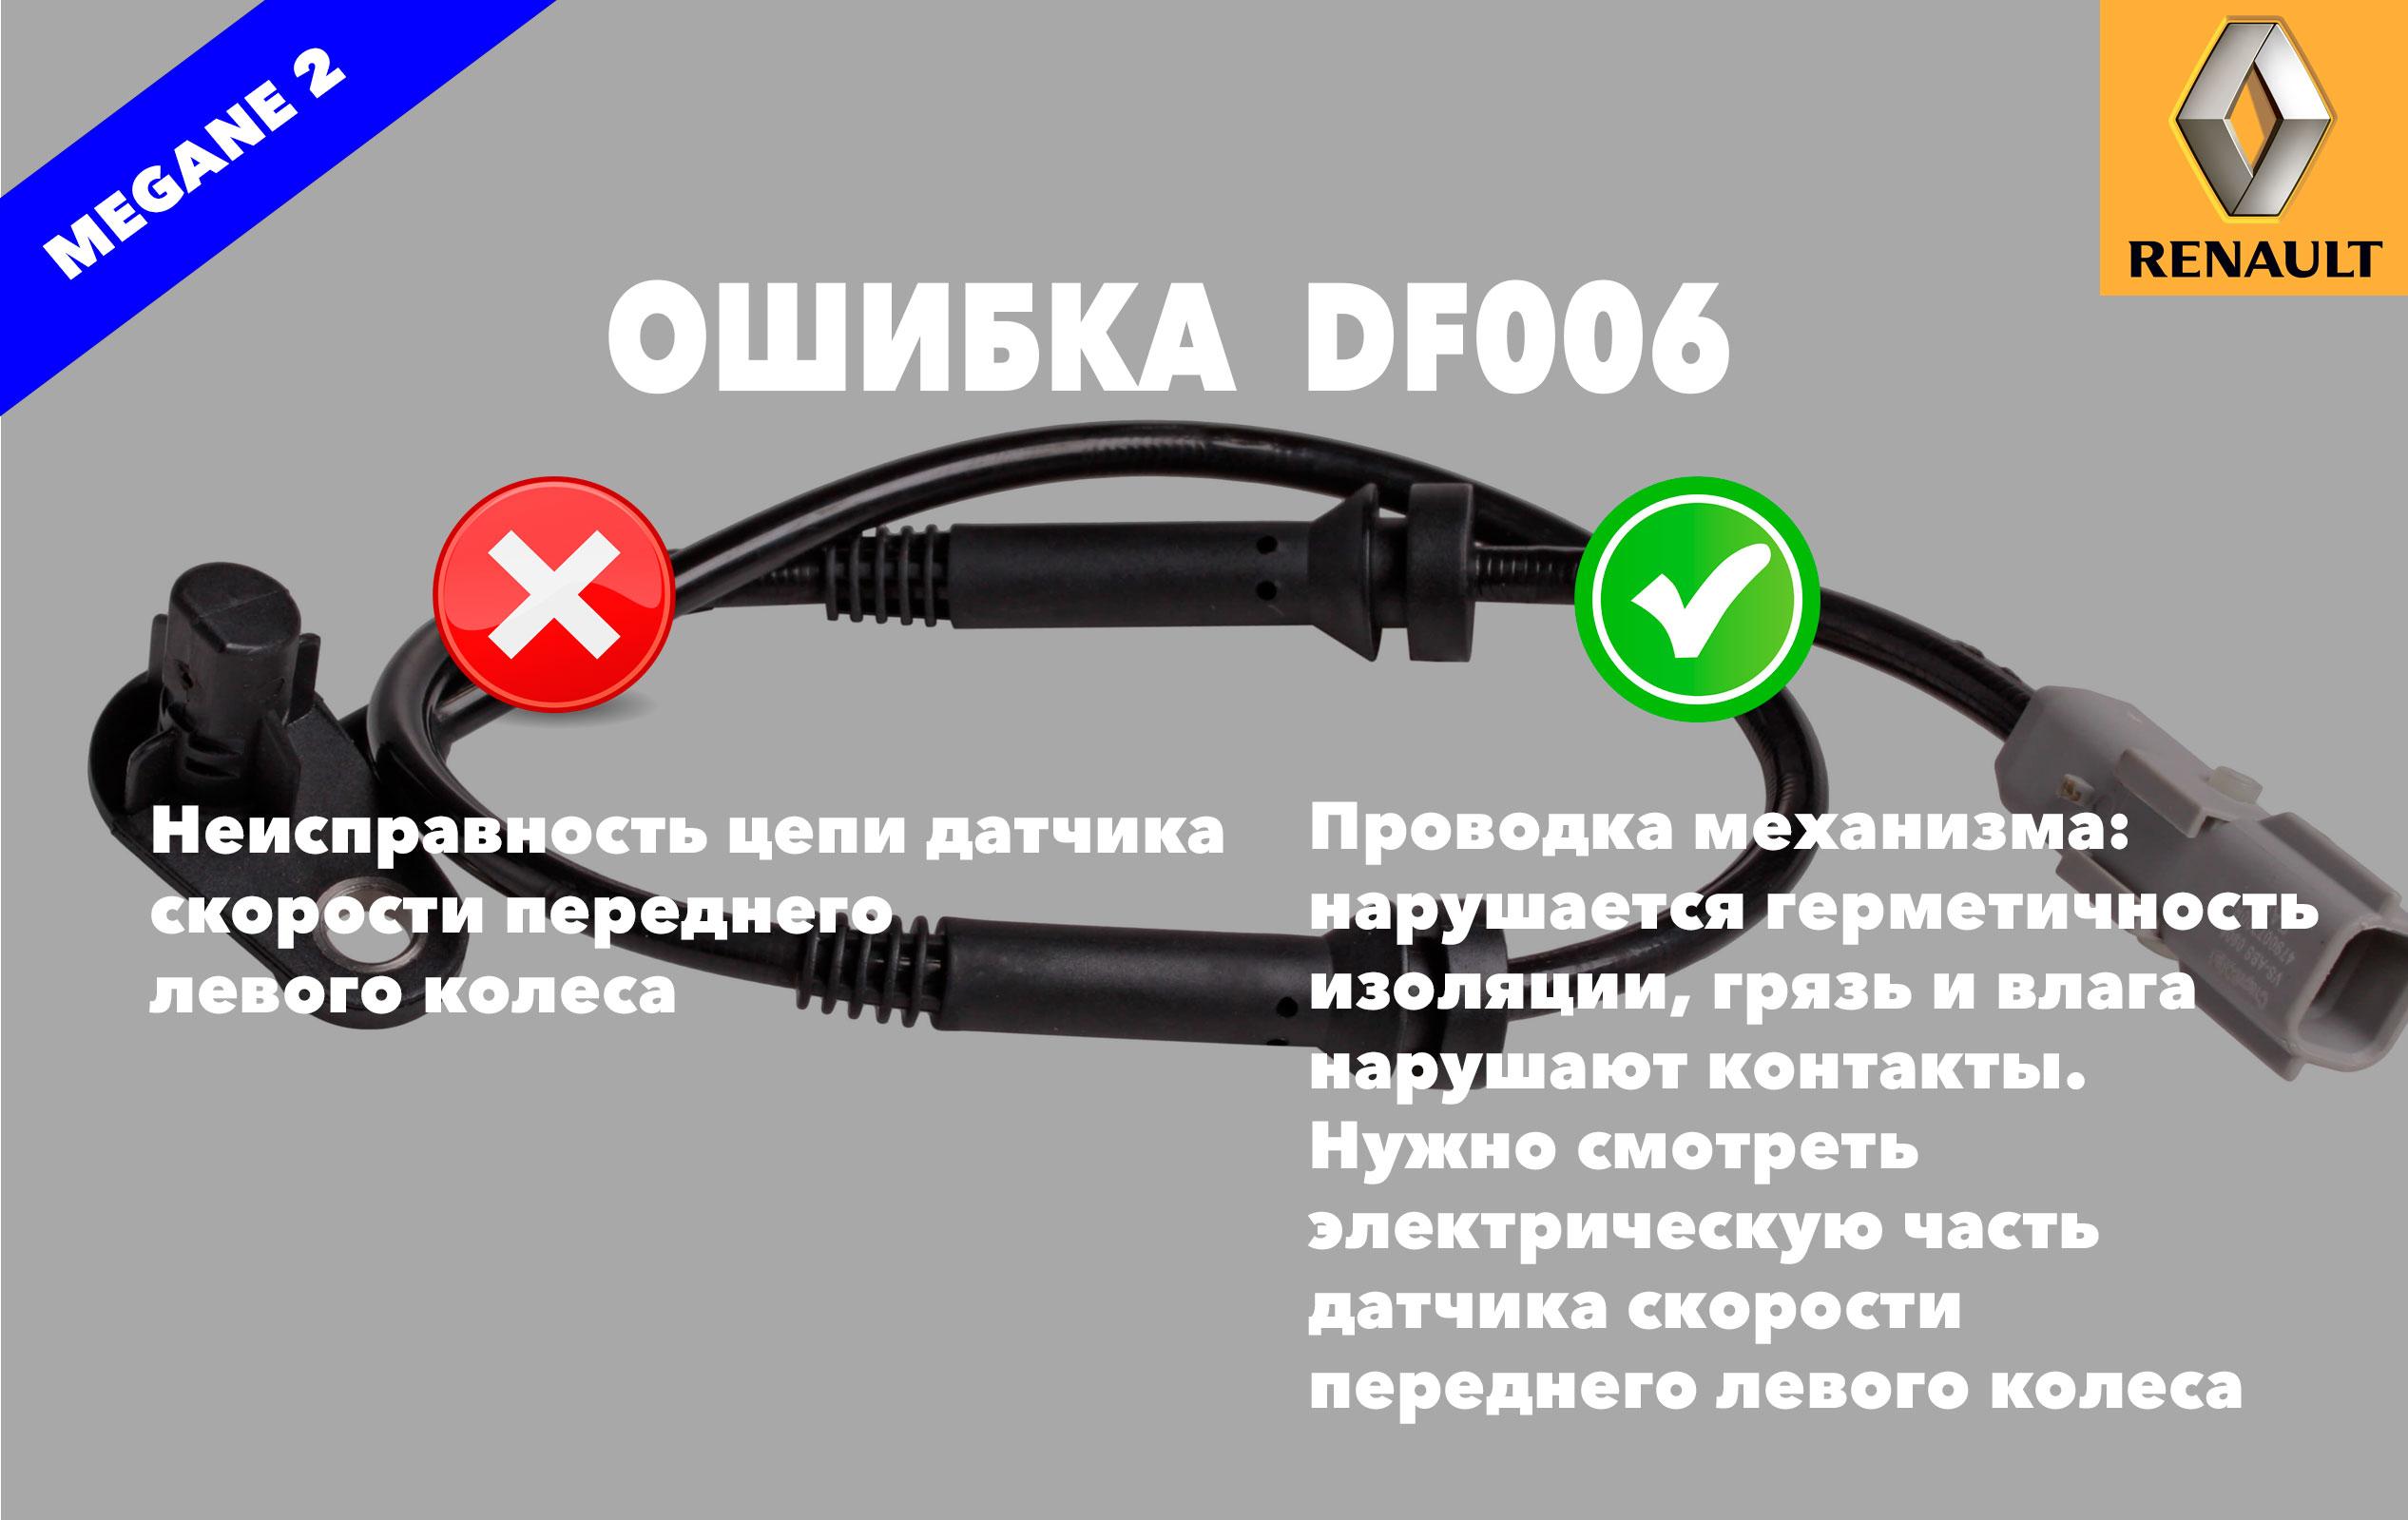 Рено Меган 2 код ошибки DF006 – неисправность цепи датчика скорости переднего левого колеса